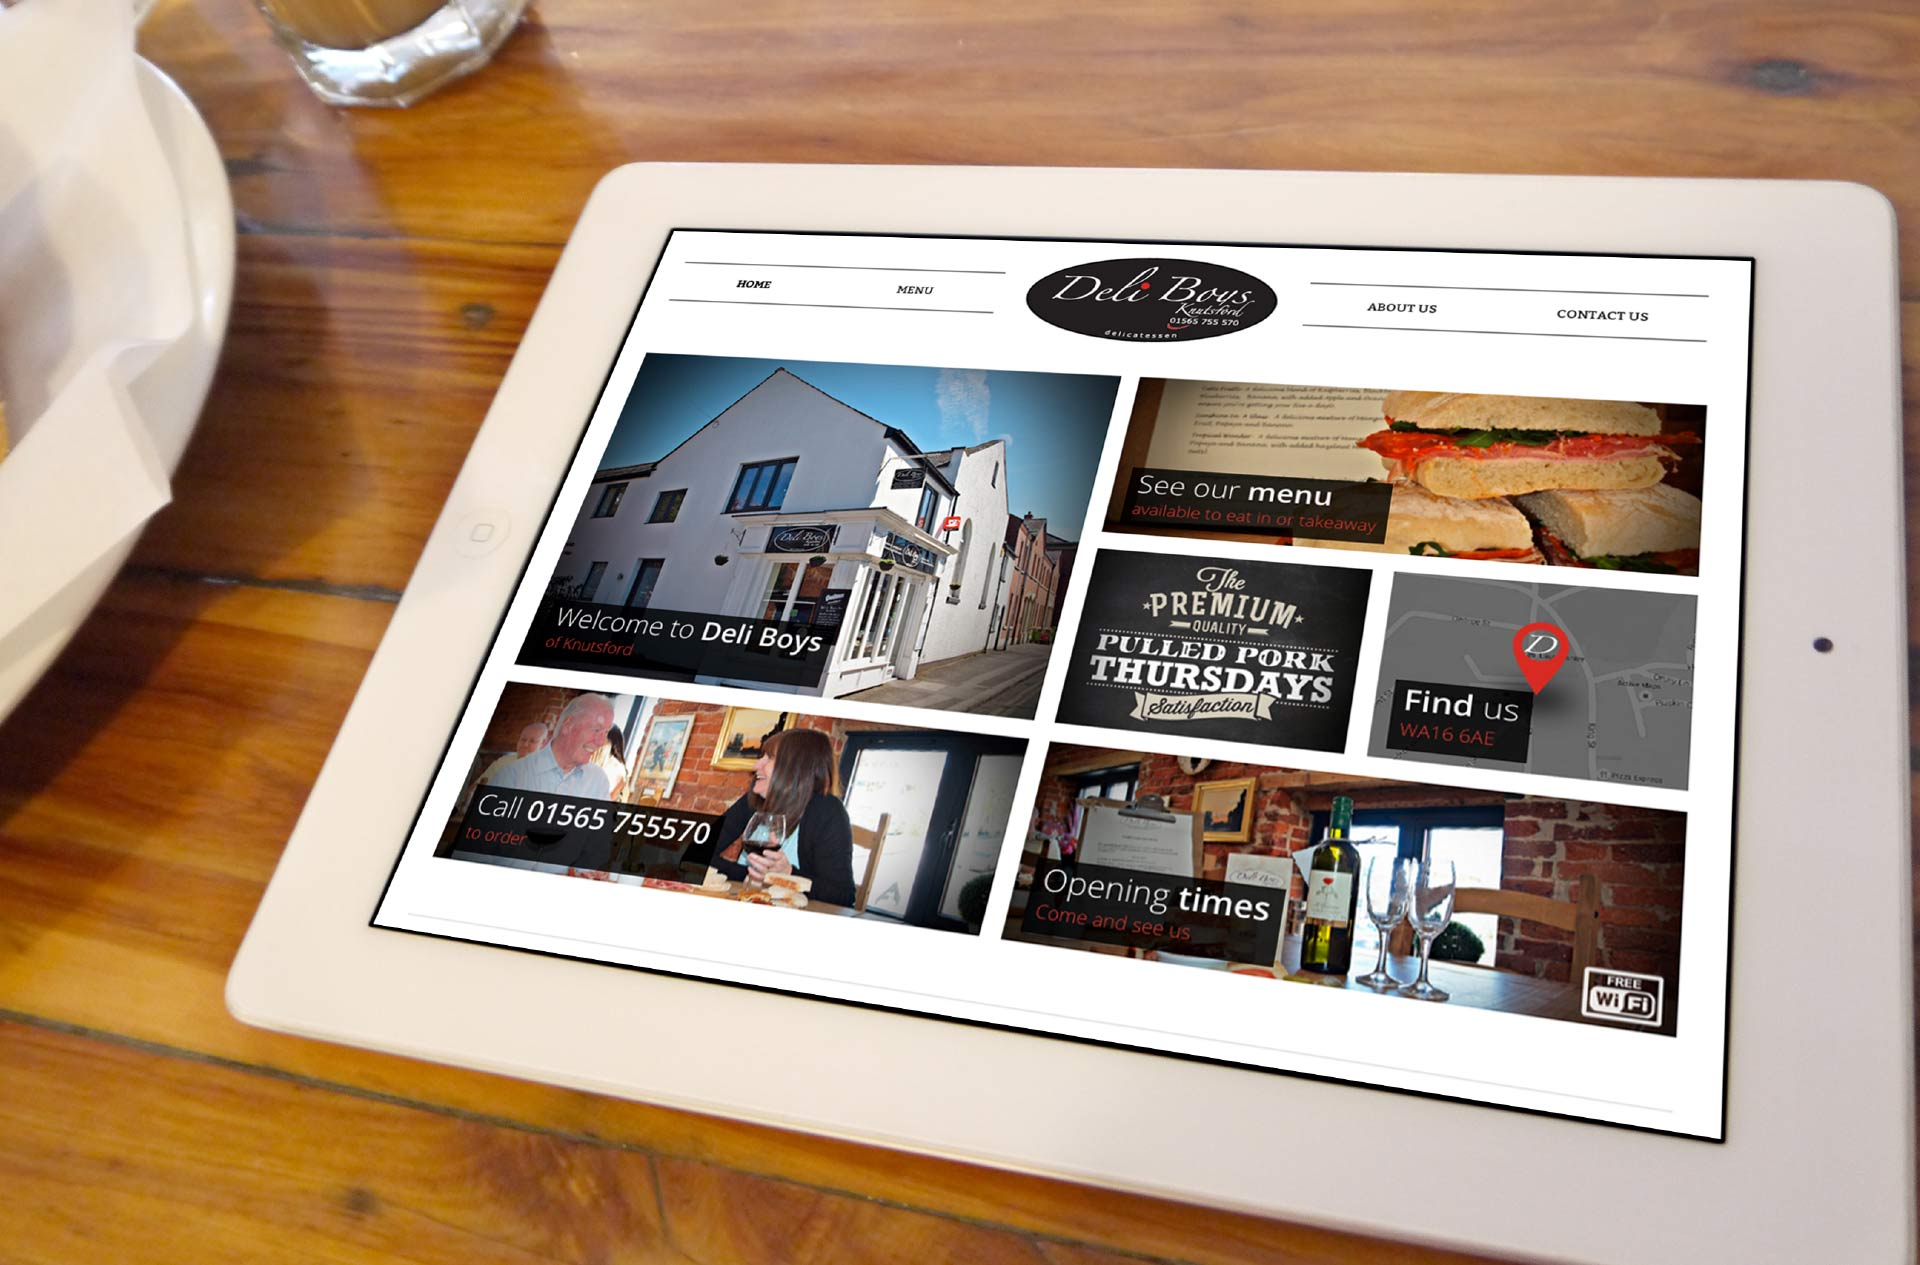 Website design for Deli Boys of Knutsford